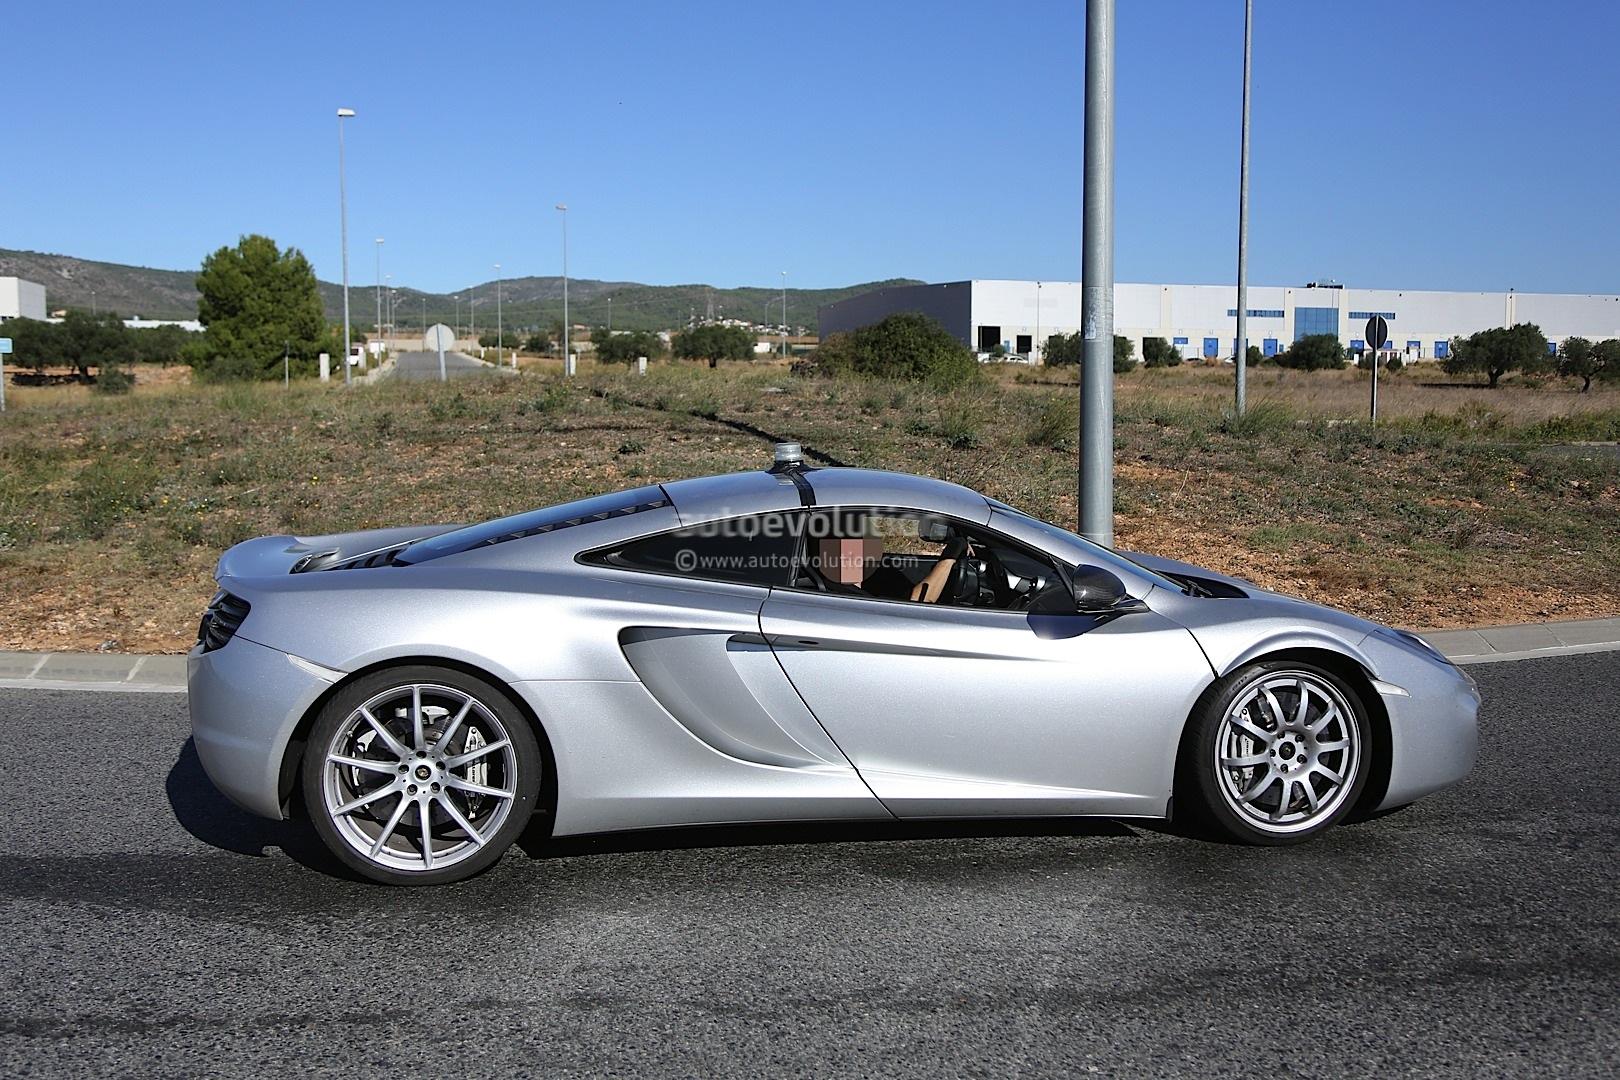 2015 - [McLaren] 570s [P13] Spyshots-mclaren-p13-sportscar-caught-chassis-testing-1080p-7